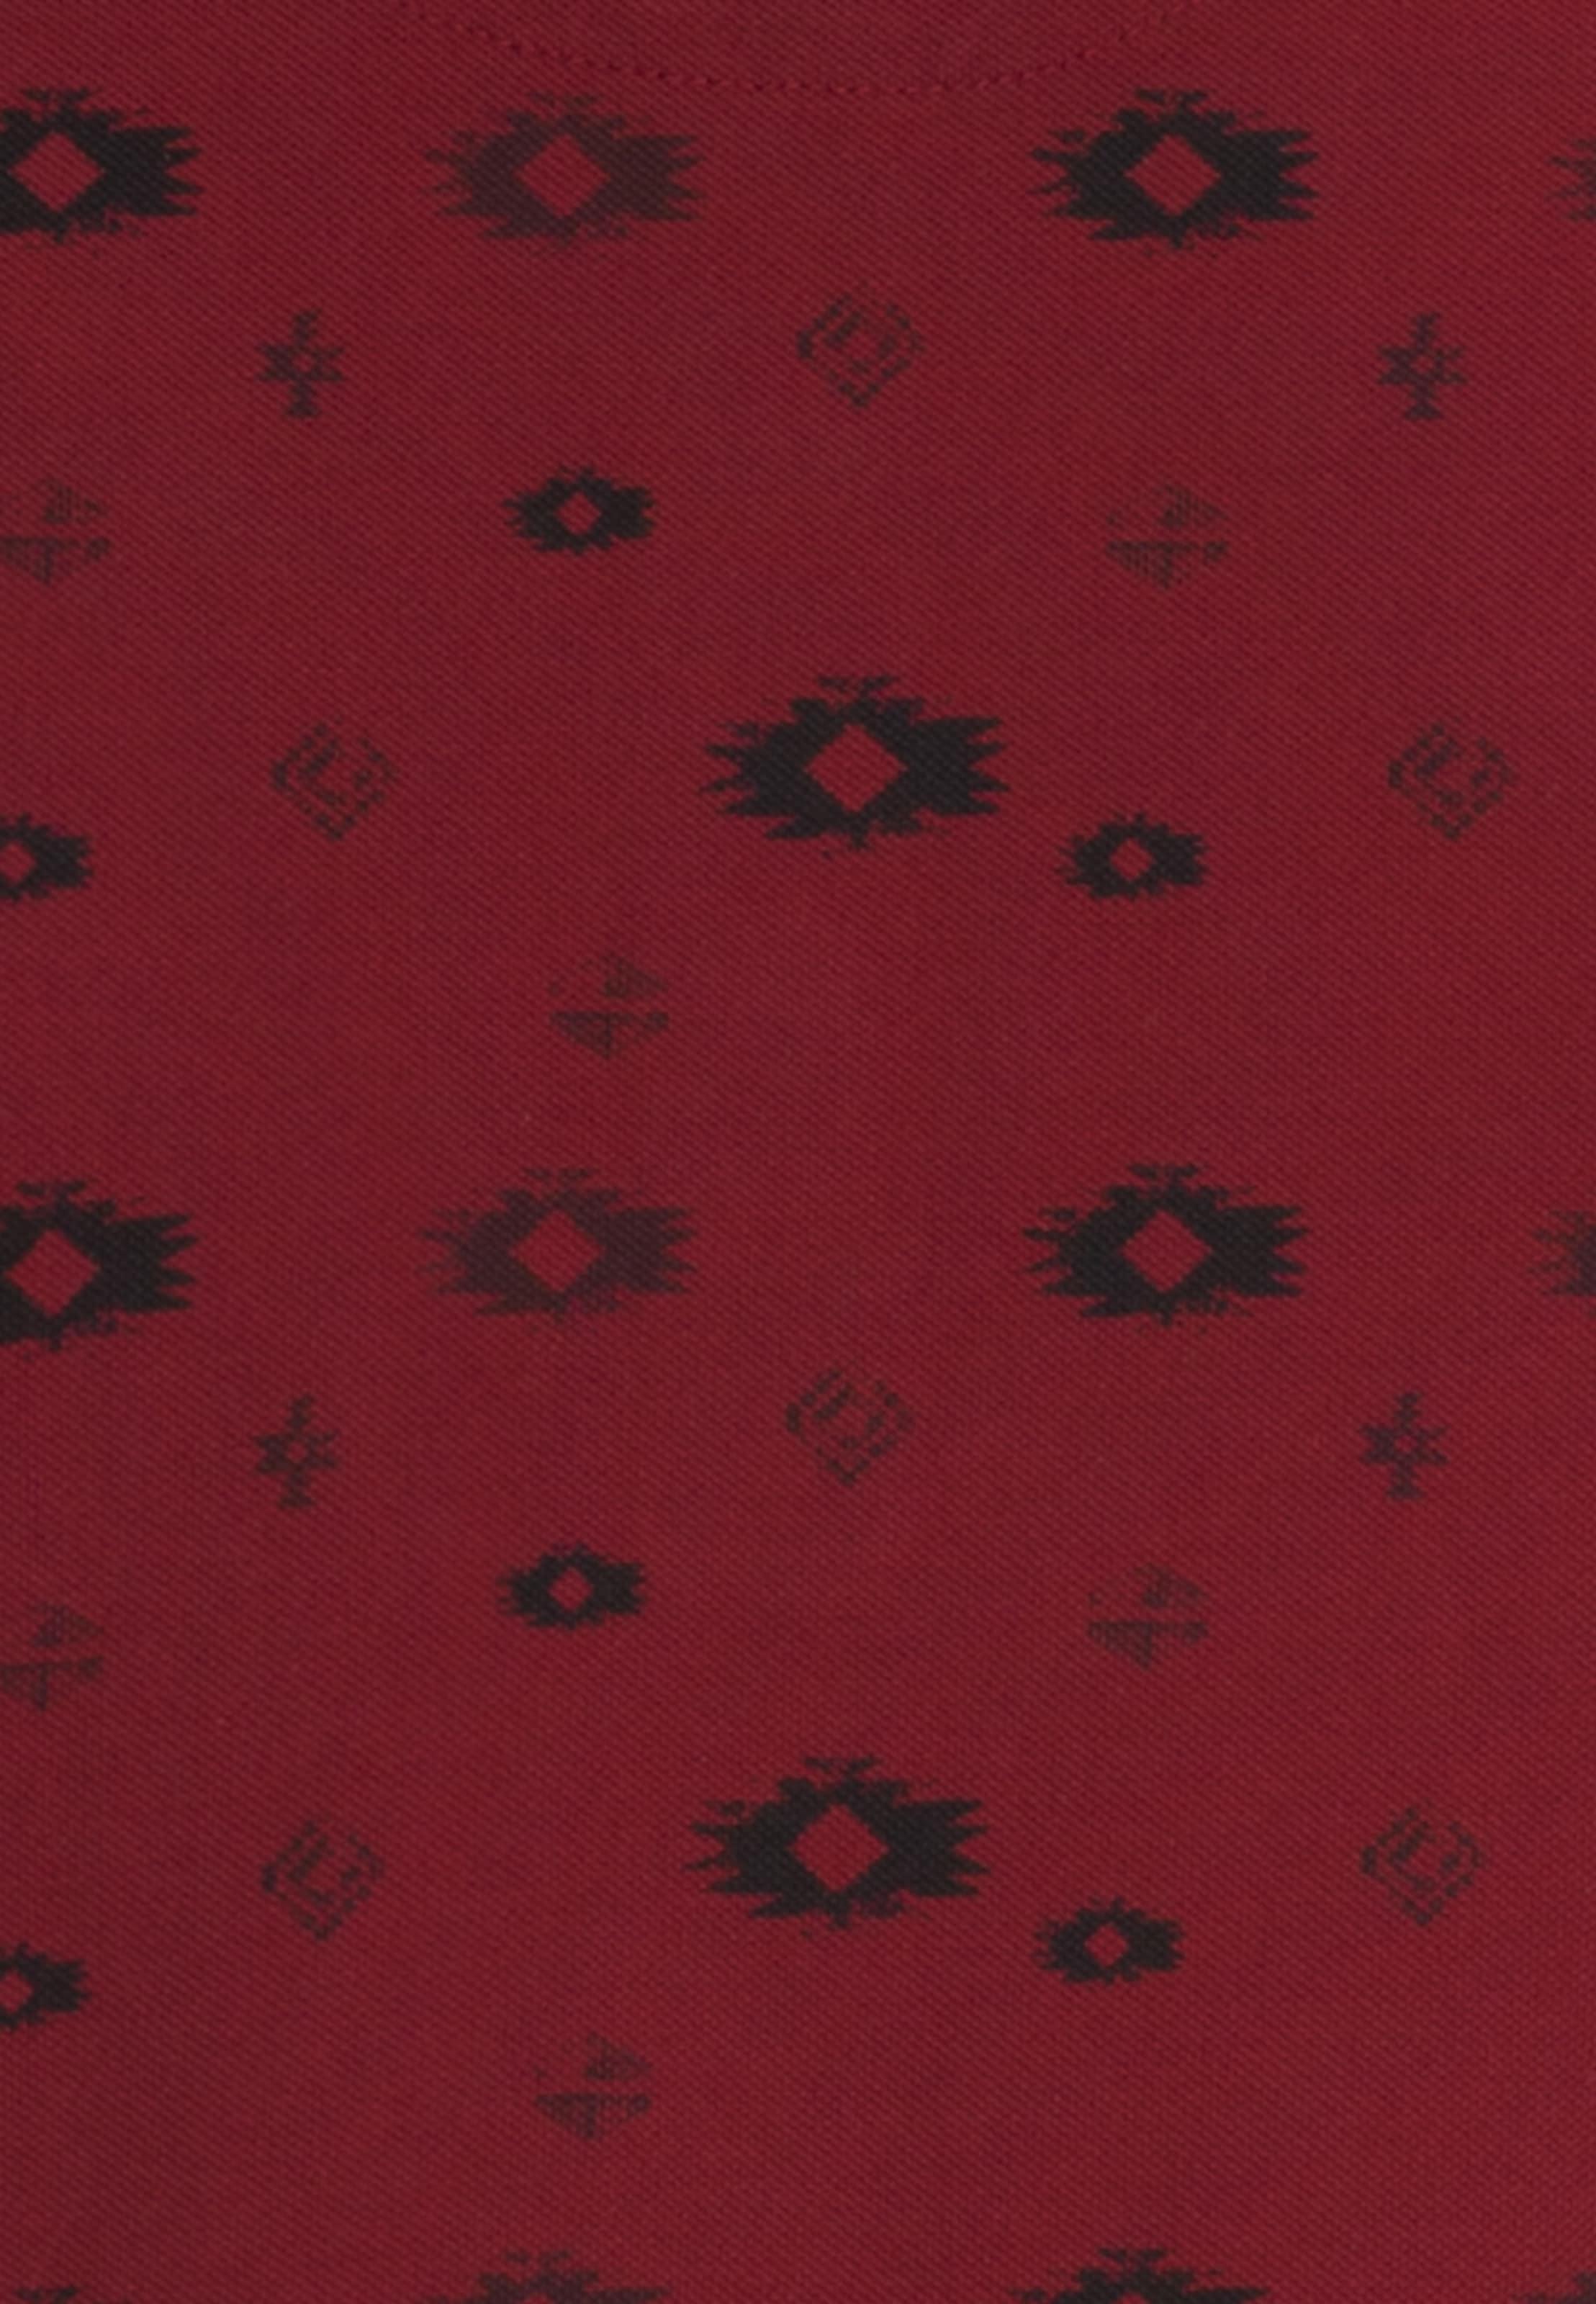 FoncéNoir T Rouge En Active shirt Camel cJlK1TF